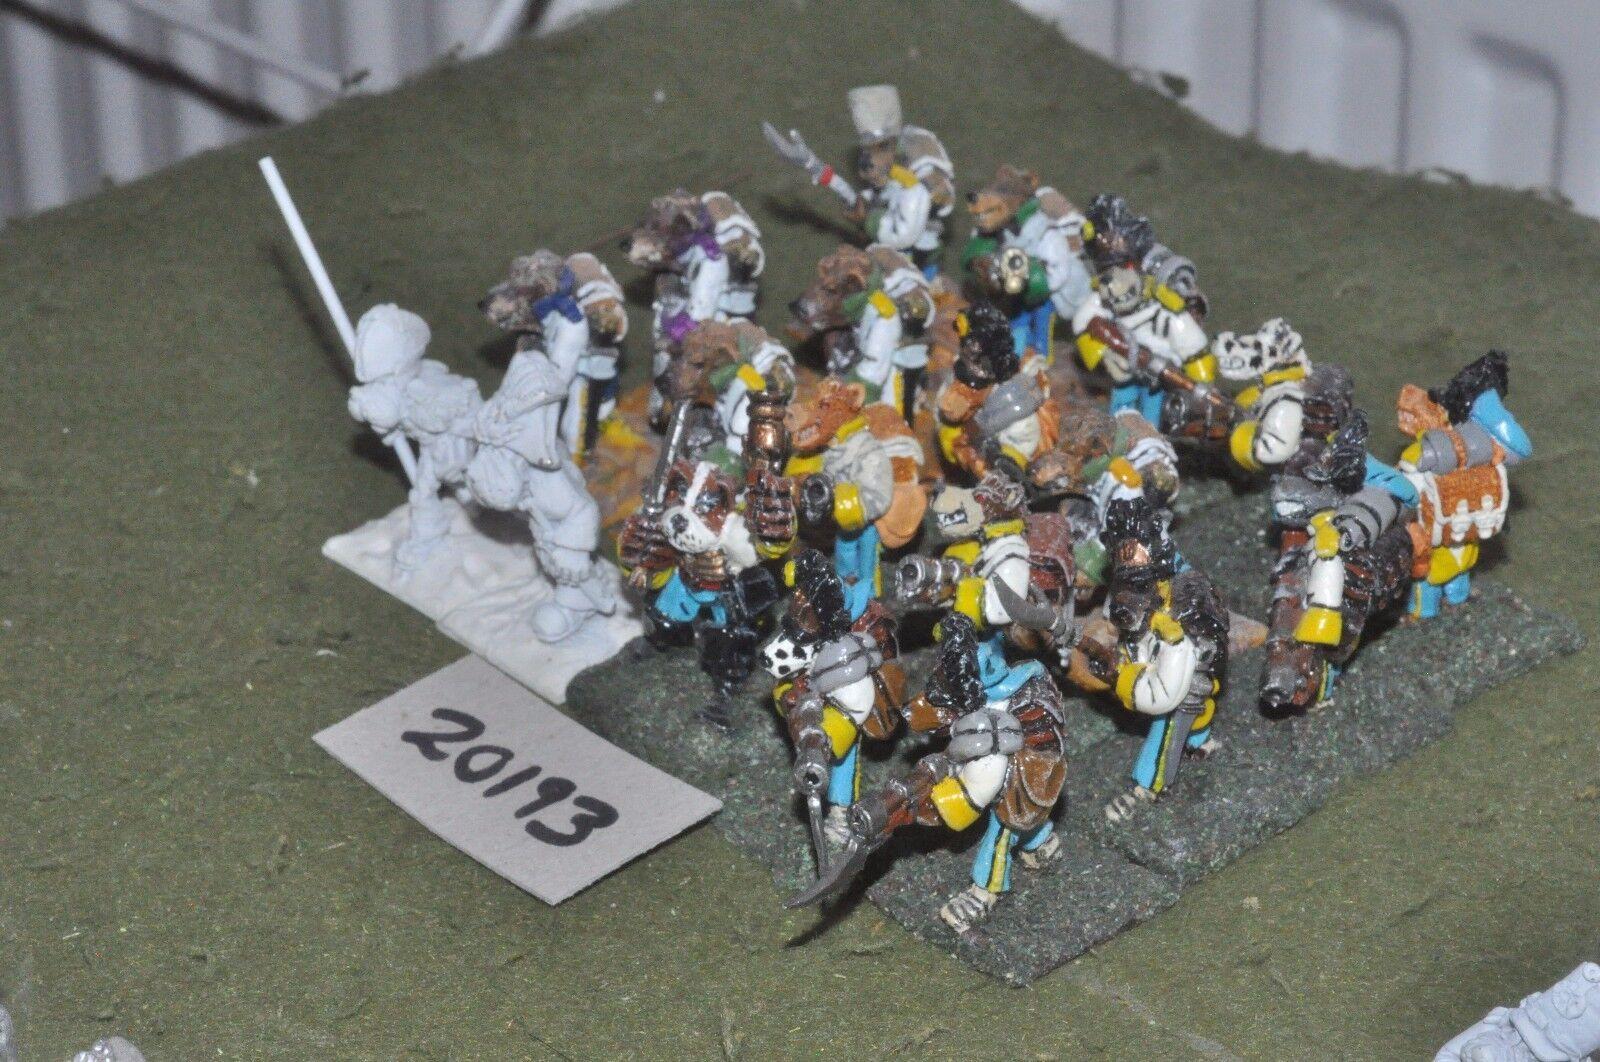 28mm flintloque fantasy Ostarian Grenadiers part painted 20 figures {16}(20193)